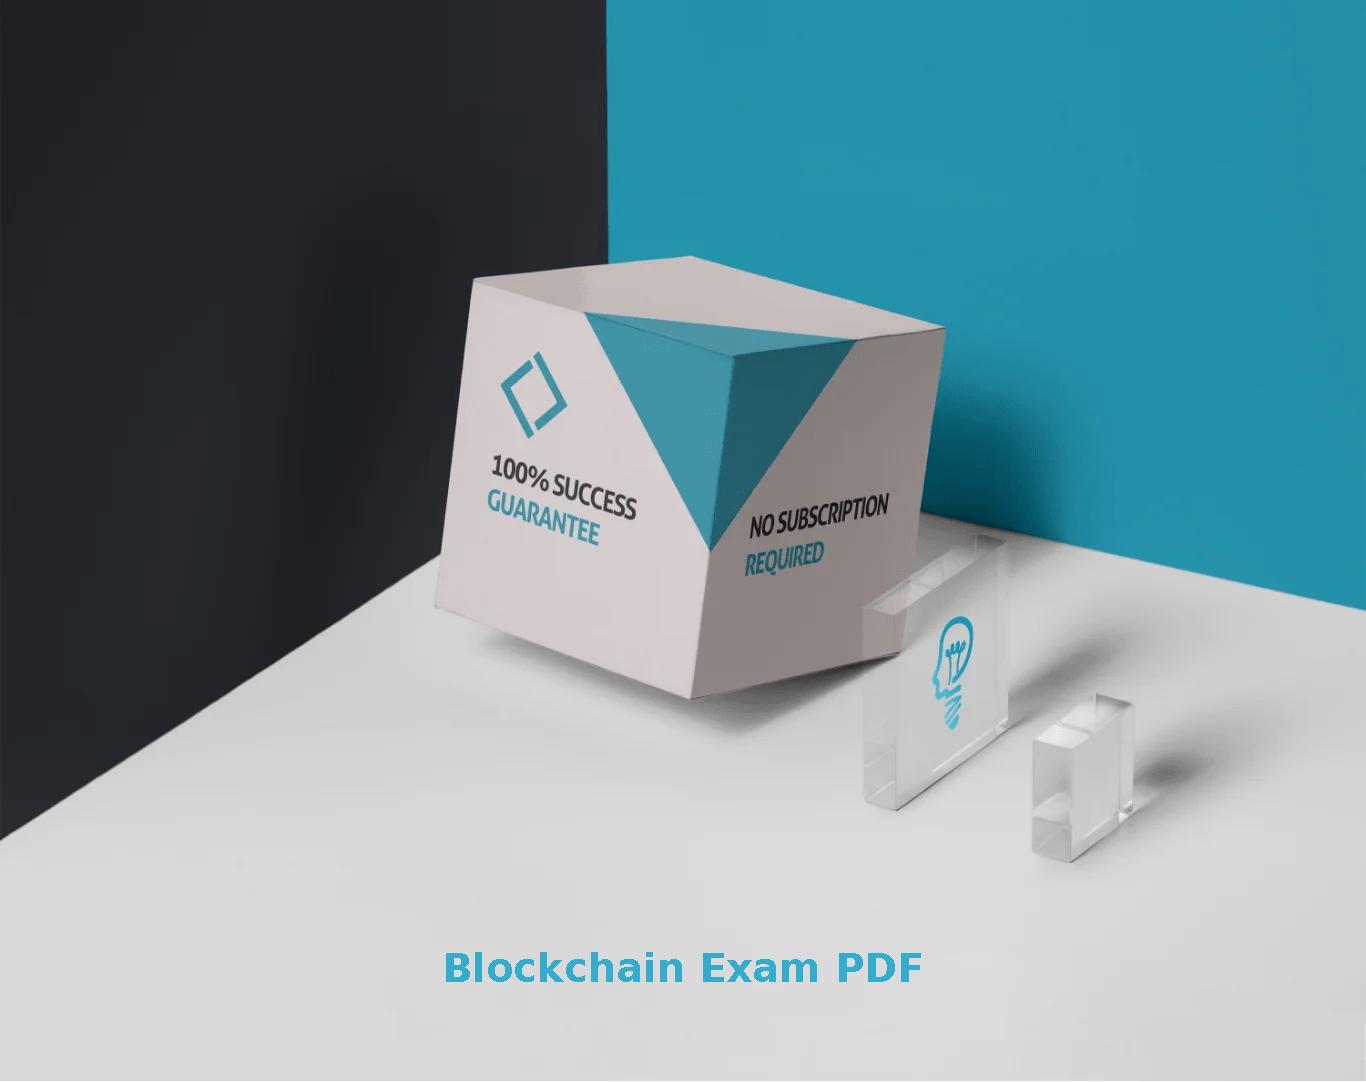 Blockchain Exam PDF